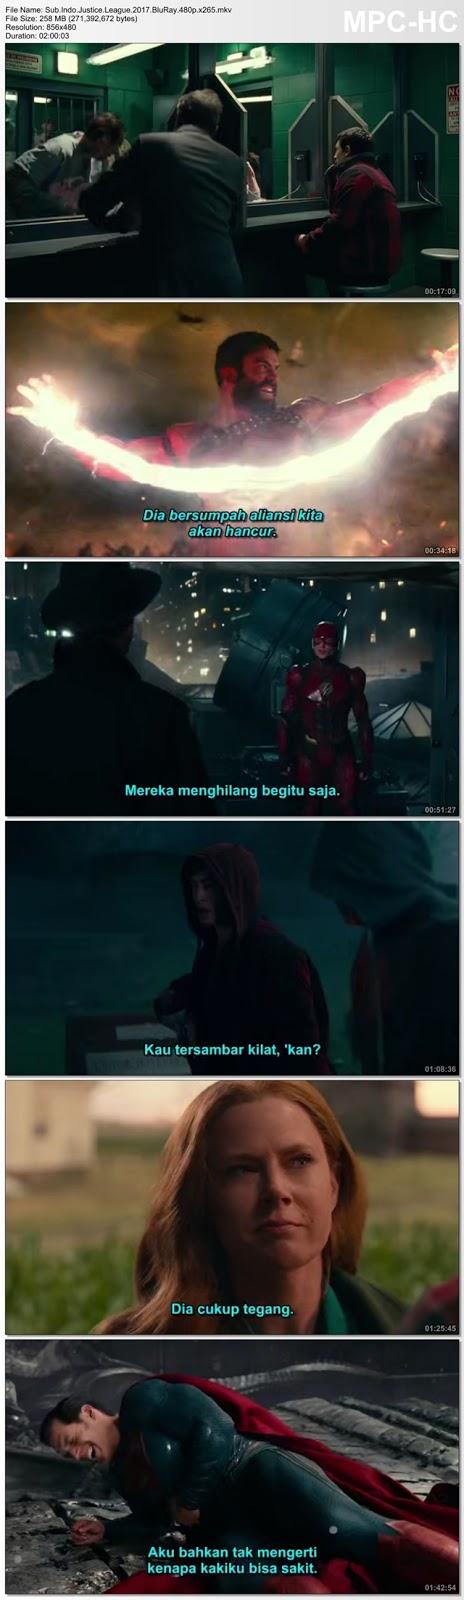 Screenshots Movie Sub.Indo.Justice League.2017.BluRay.480p.x265.mkv